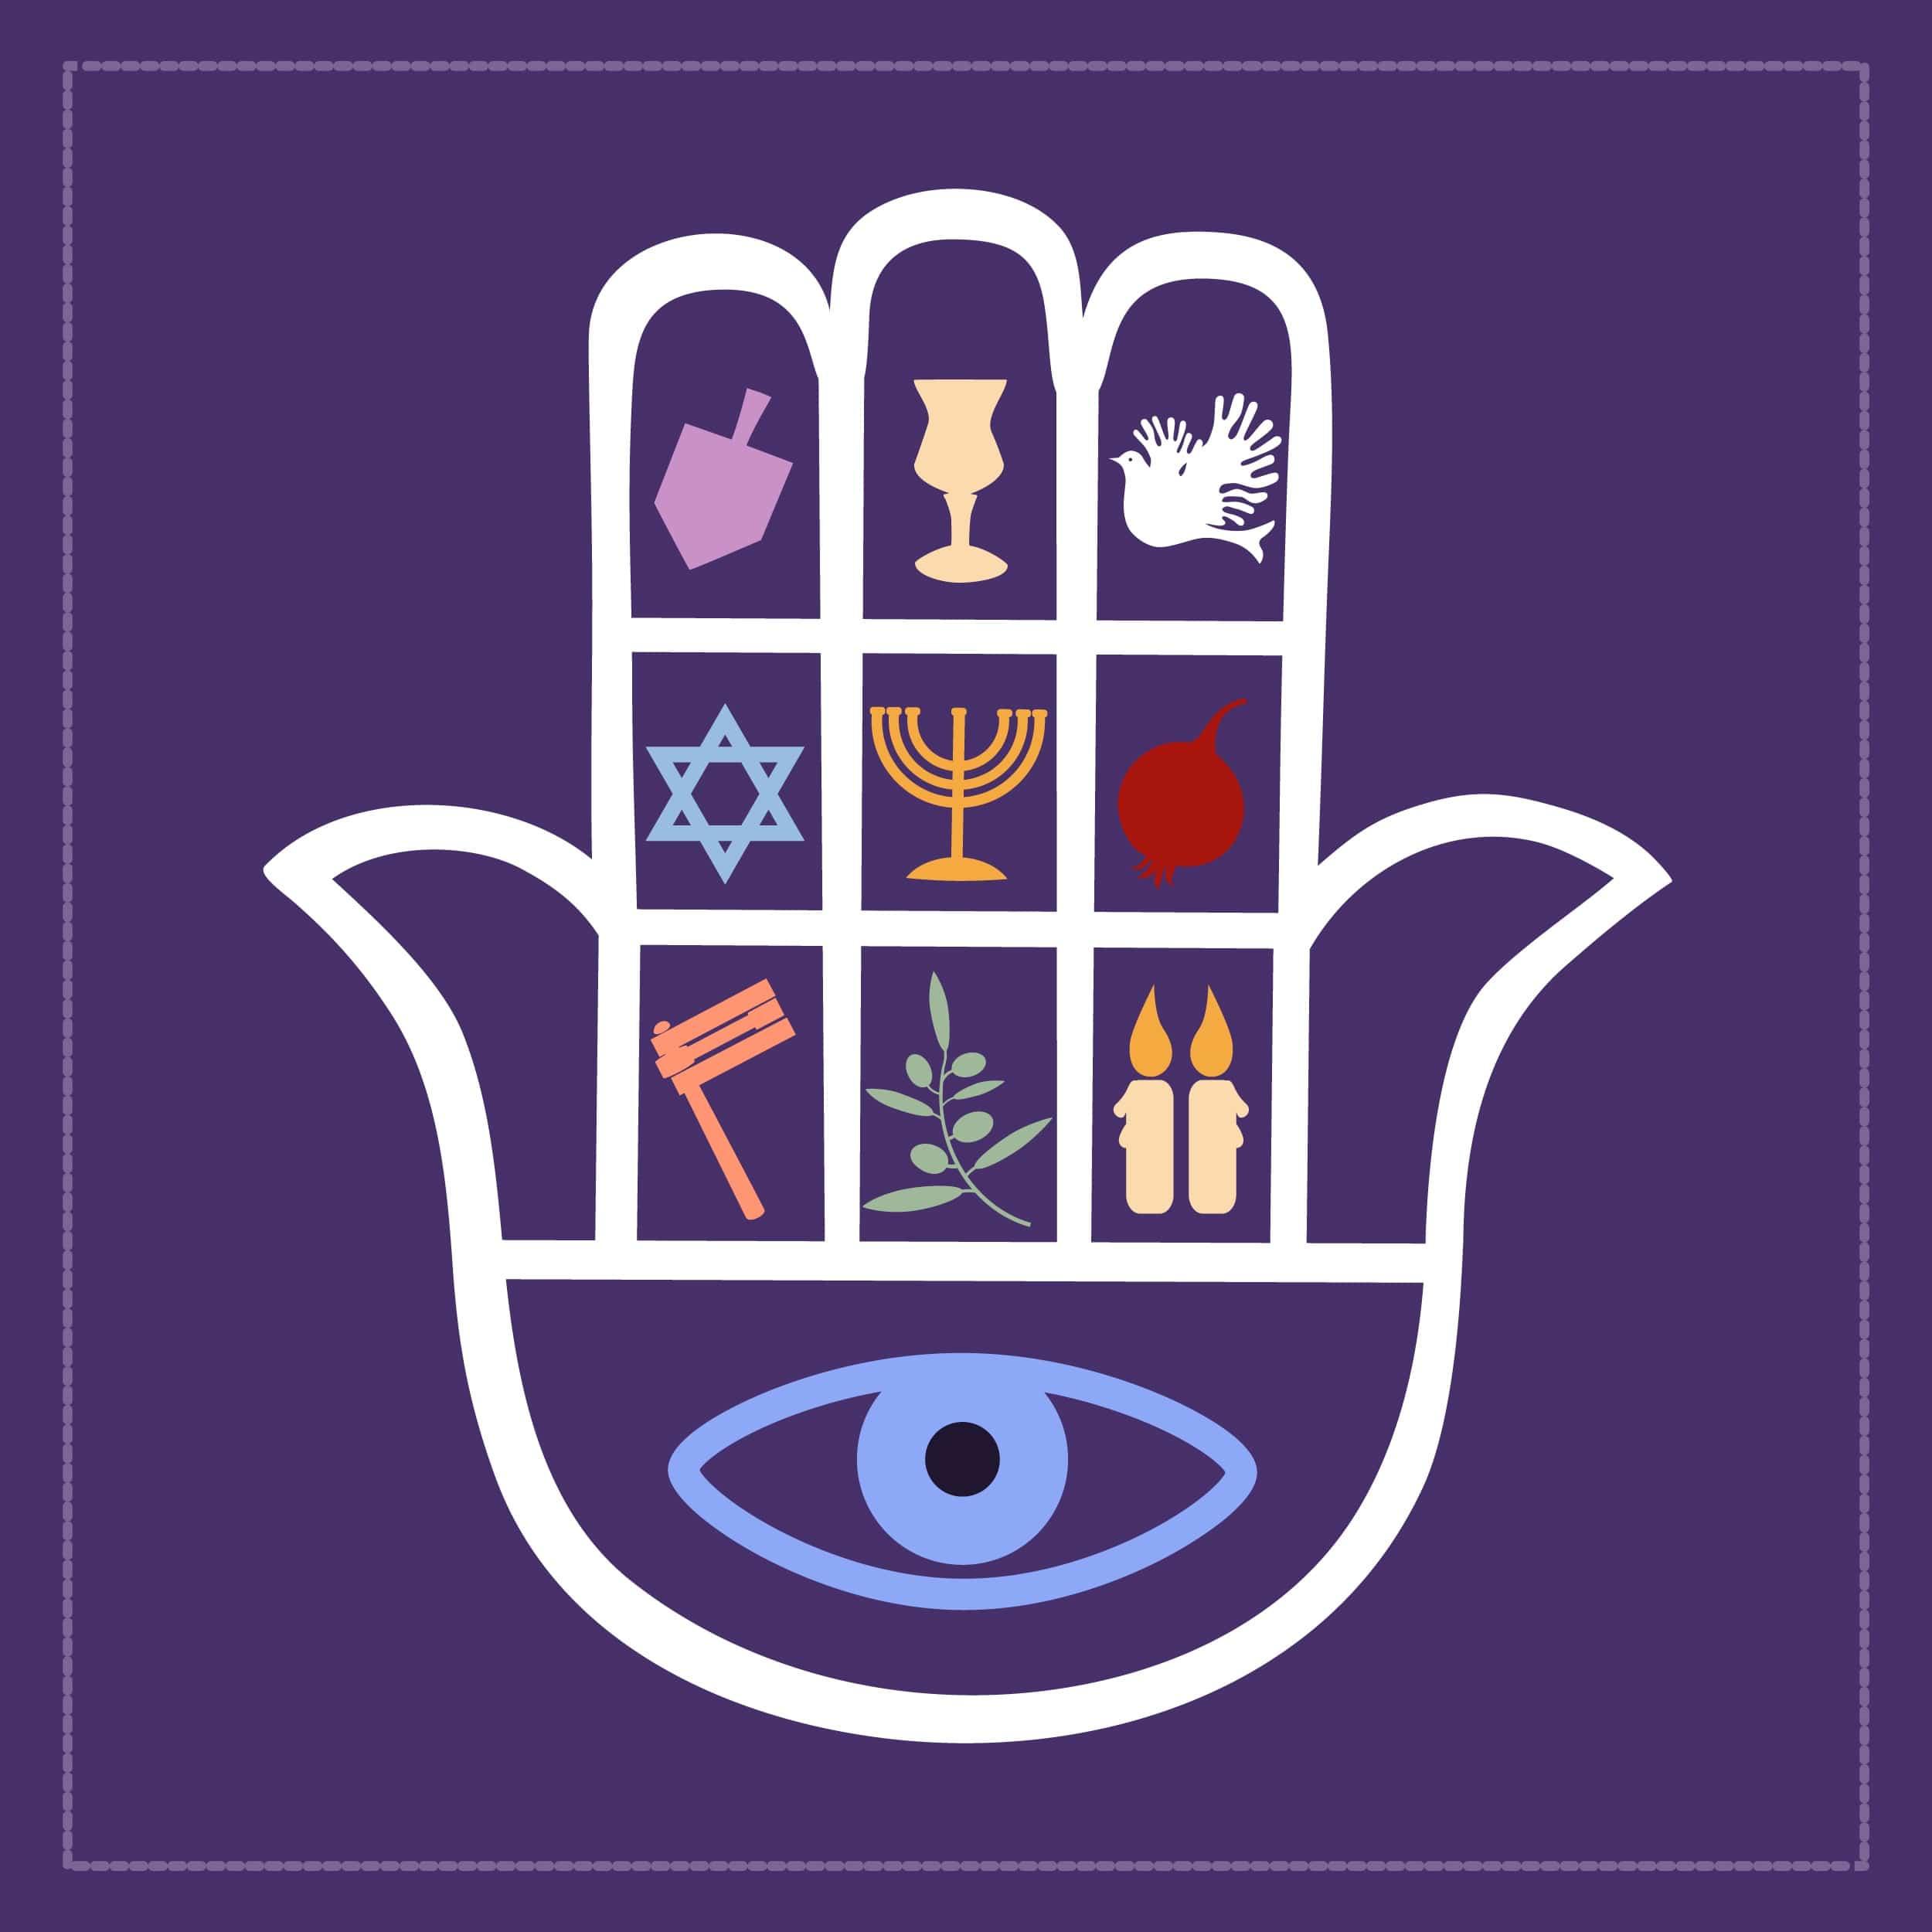 Images of Jewish Holidays